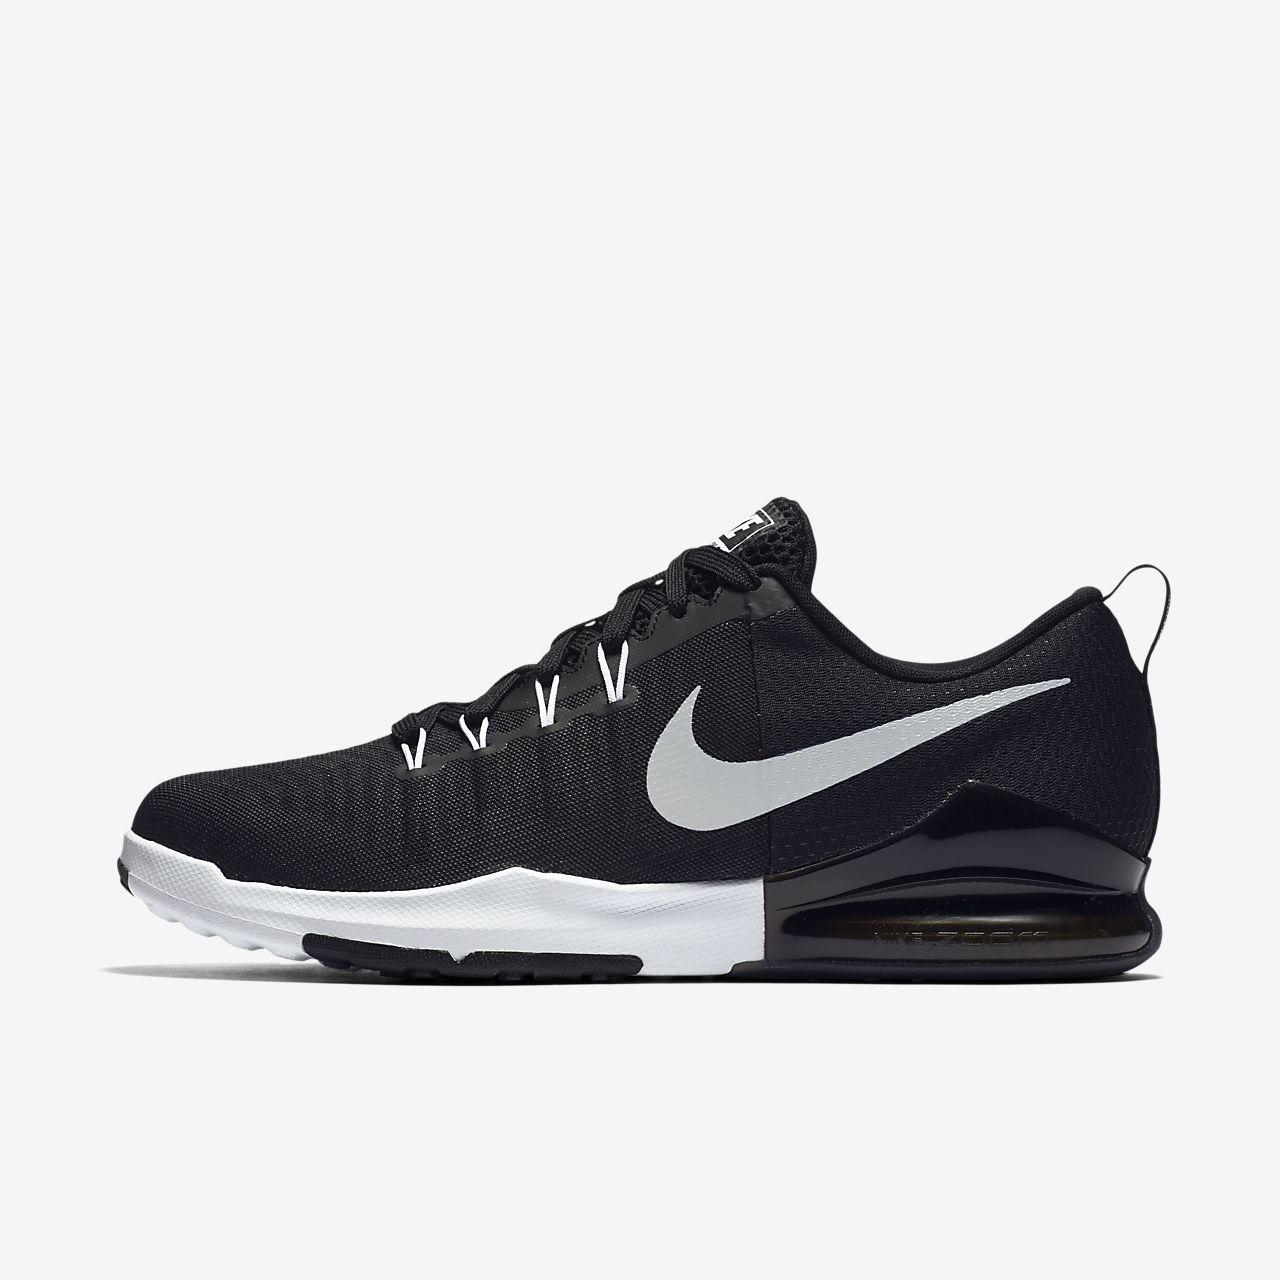 buy online 57320 67039 TIEMPO TRAINER MEDIO M NR Scarpe Da Uomo Nike